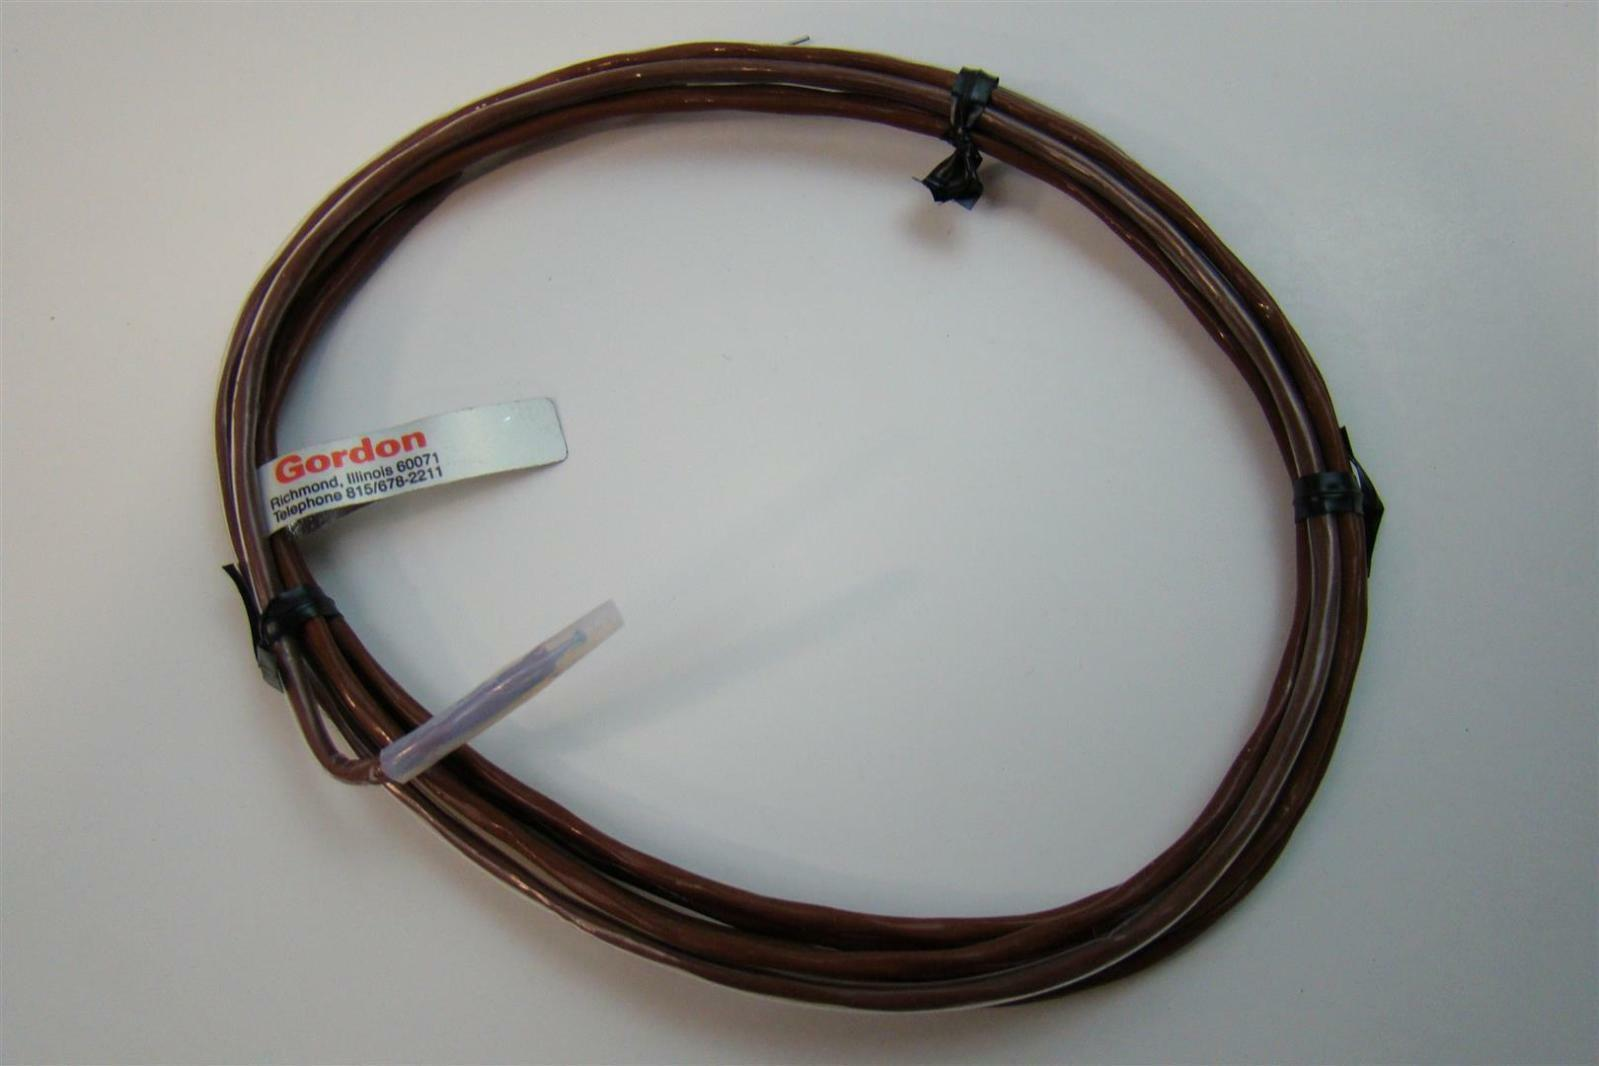 Gordon Thermocouple Type J 9FT SP8   eBay